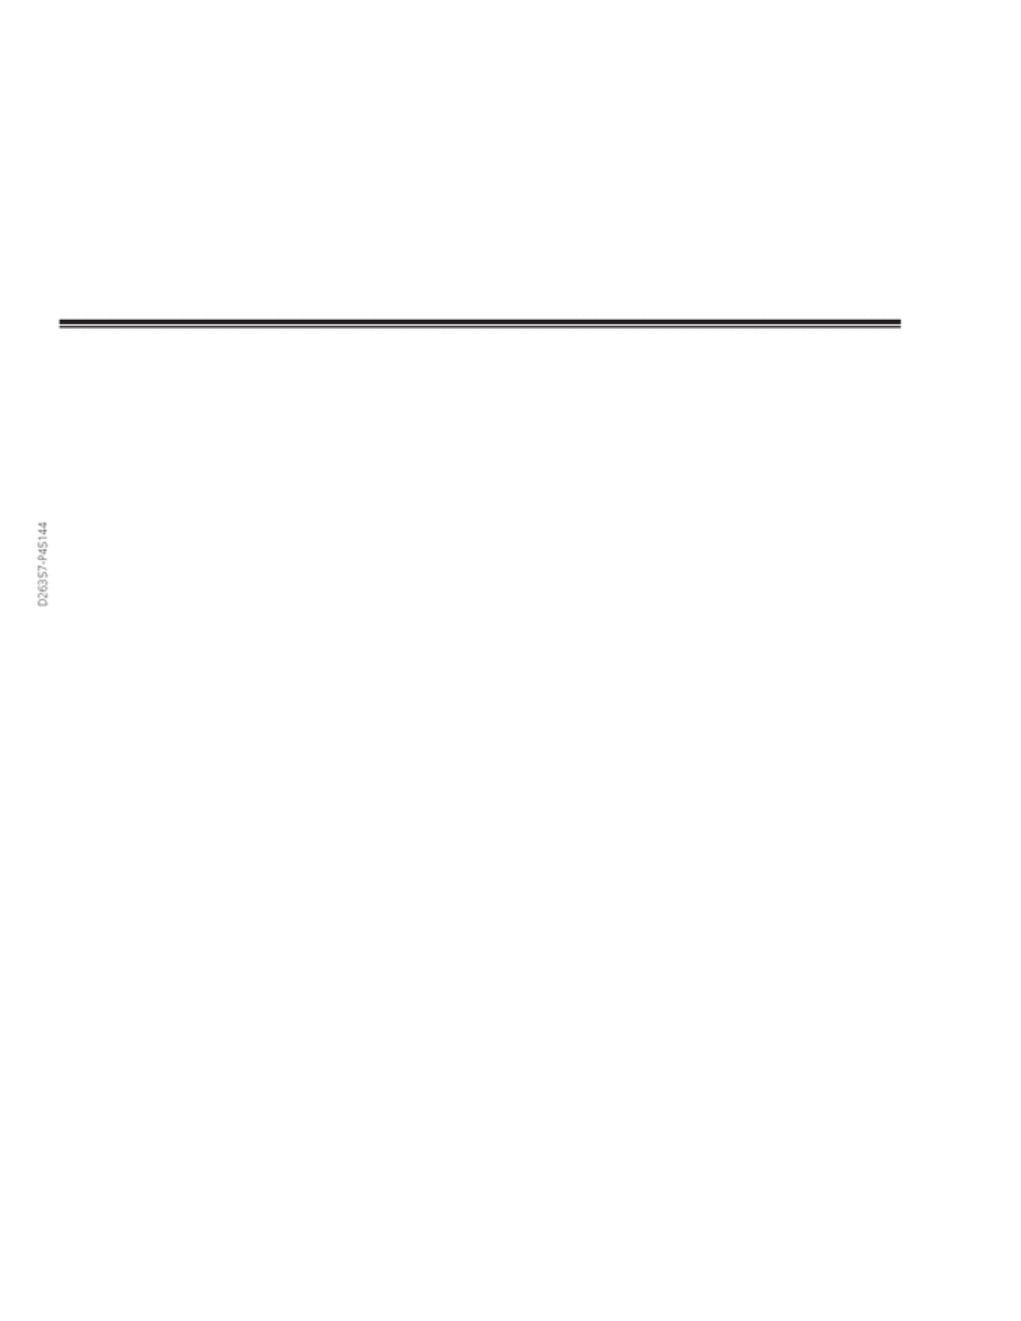 20-12345-1 BA_AMPIO PHARMACEUTICALS IN- CC_PAGE_4.GIF